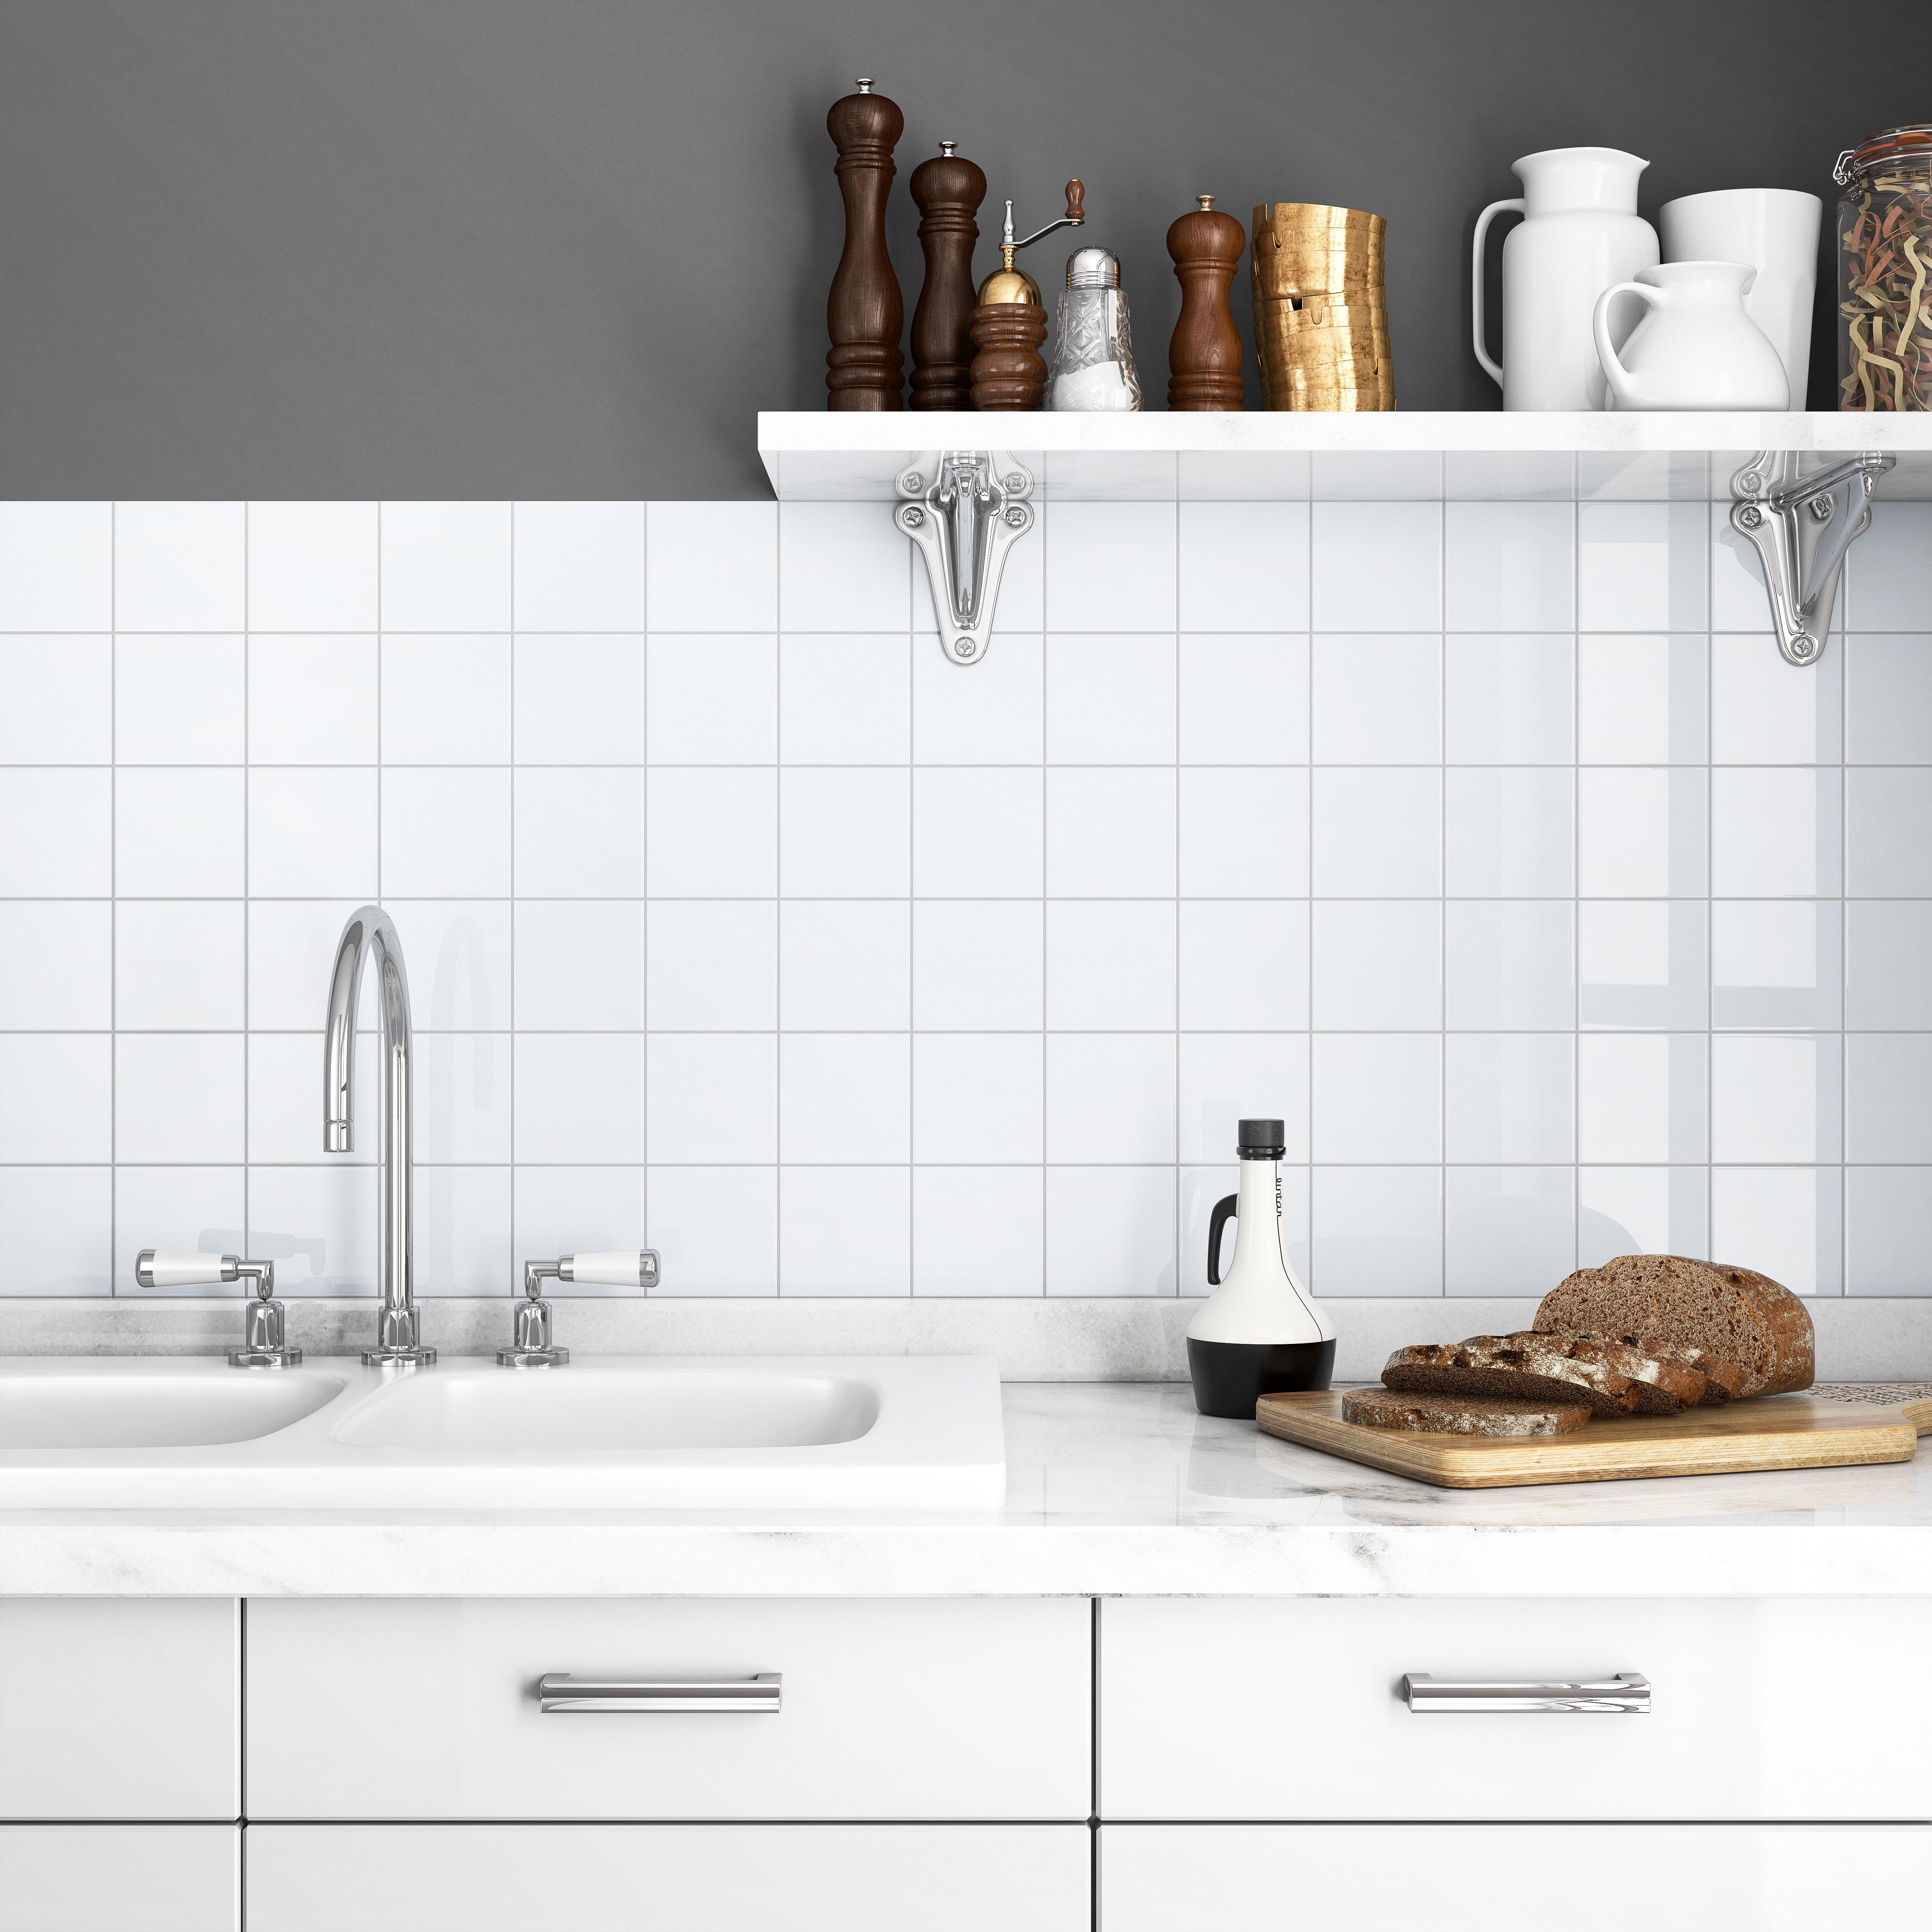 - BOX OF 80 White 4x4 Shiny Glossy Finish Ceramic Tile Backsplash